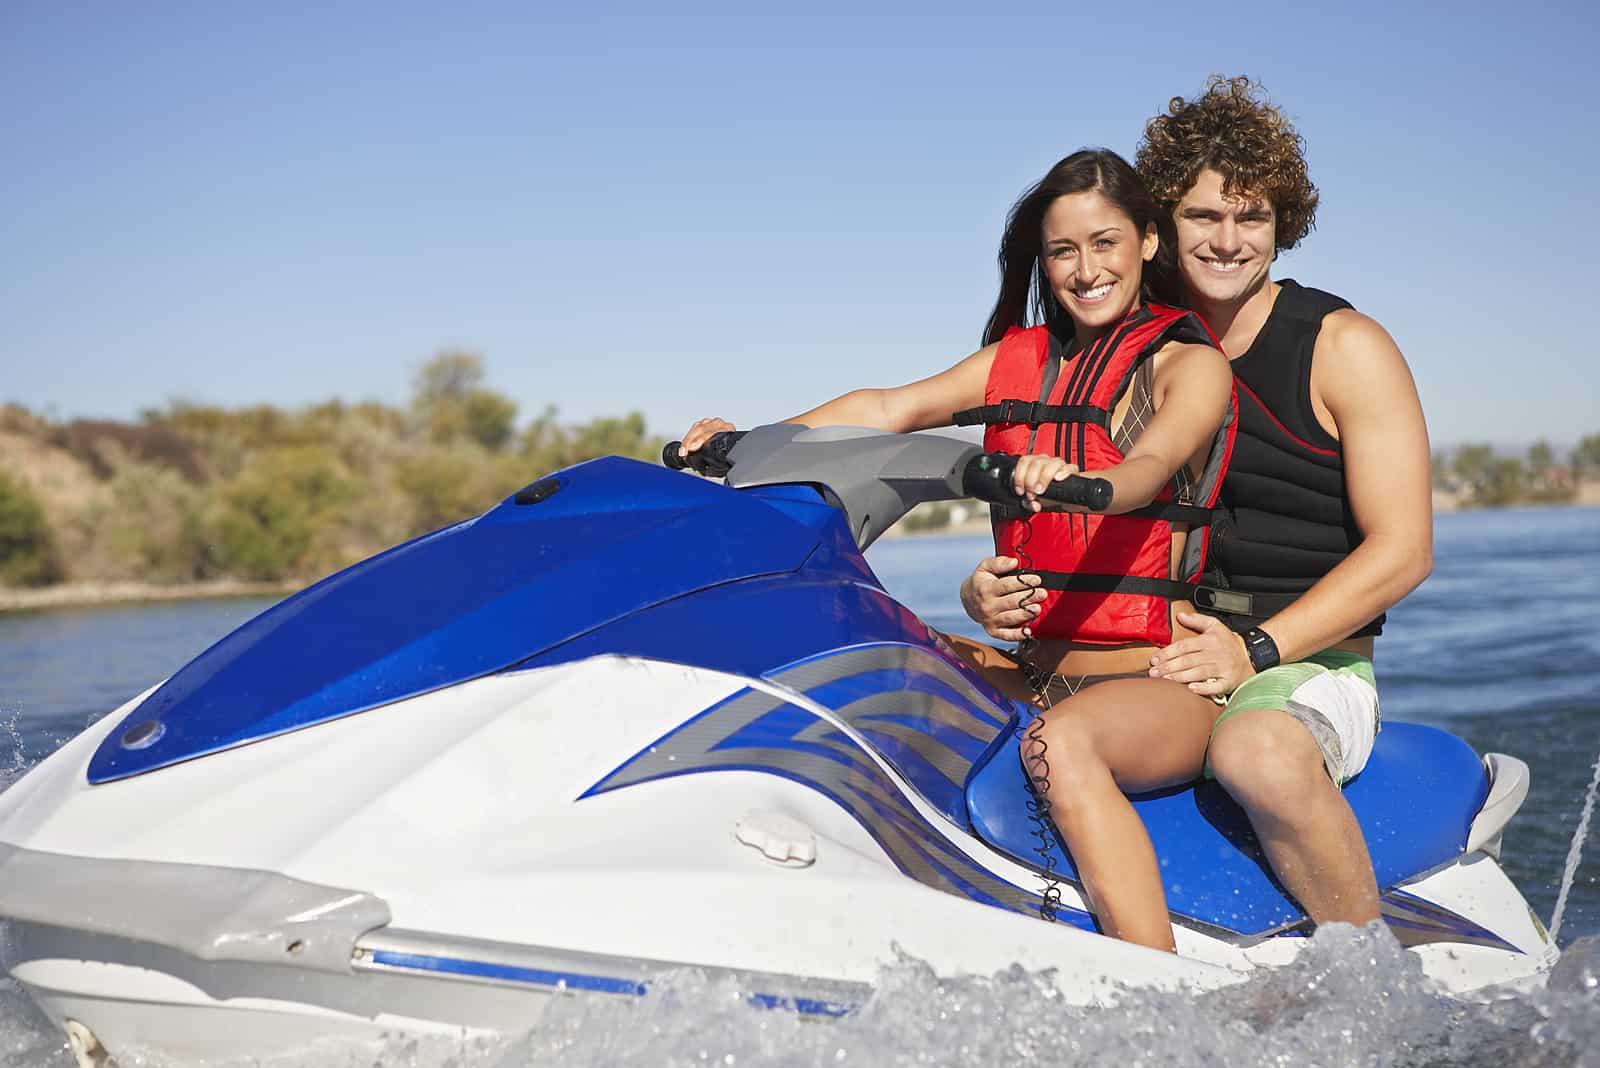 happy caucasian couple riding jet ski on lake